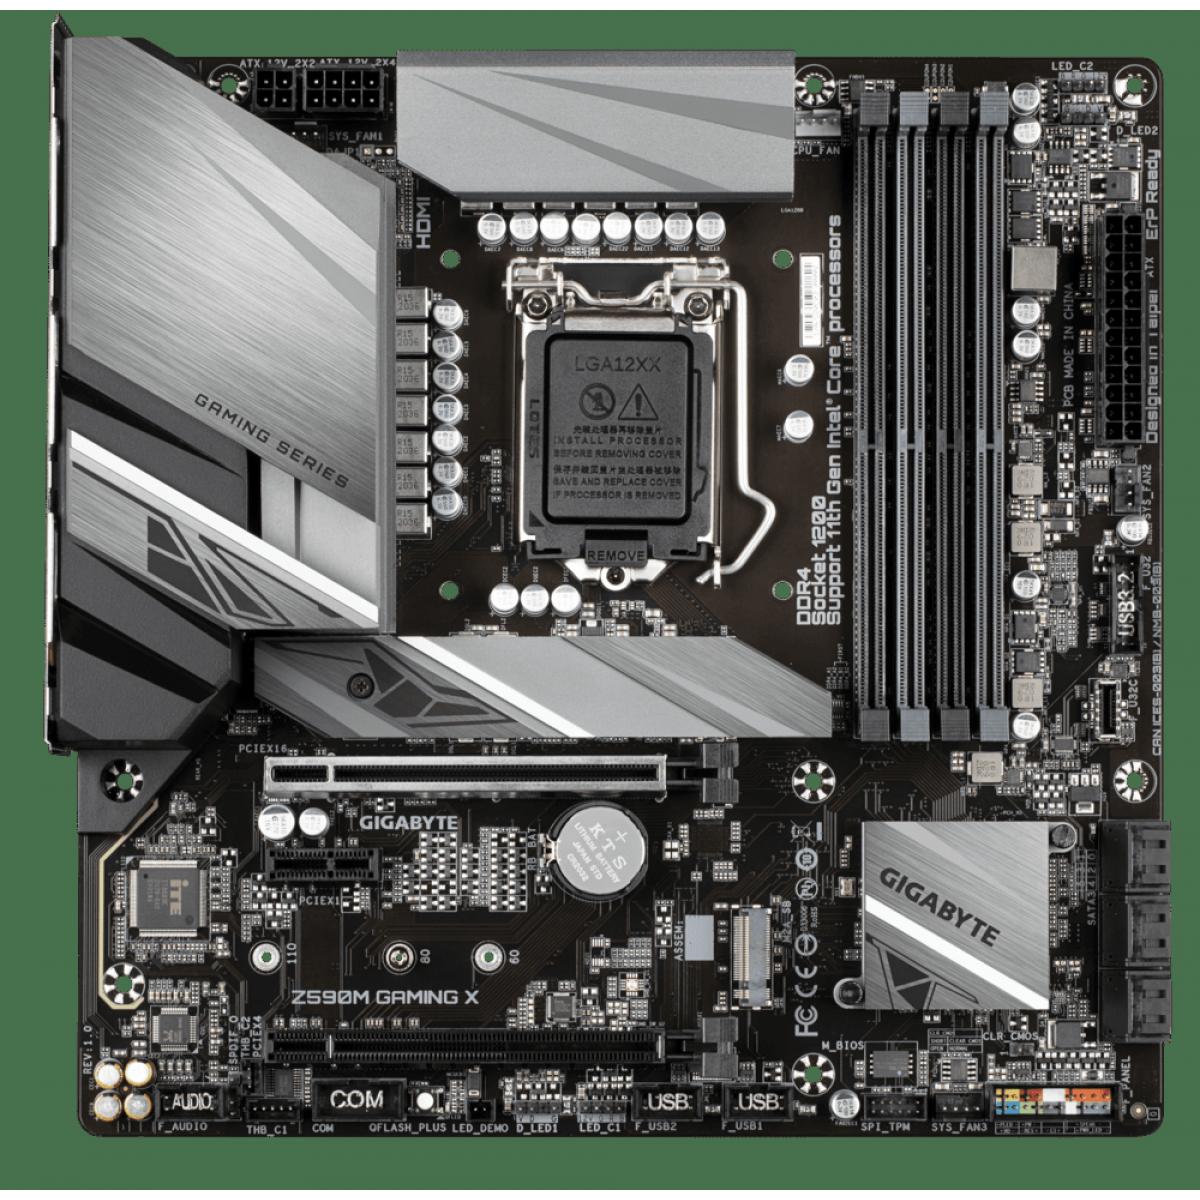 Placa Mãe GIGABYTE Z590M GAMING X (rev. 1.0), Intel Z590 Express Chipset, Socket 1200, mATX, DDR4